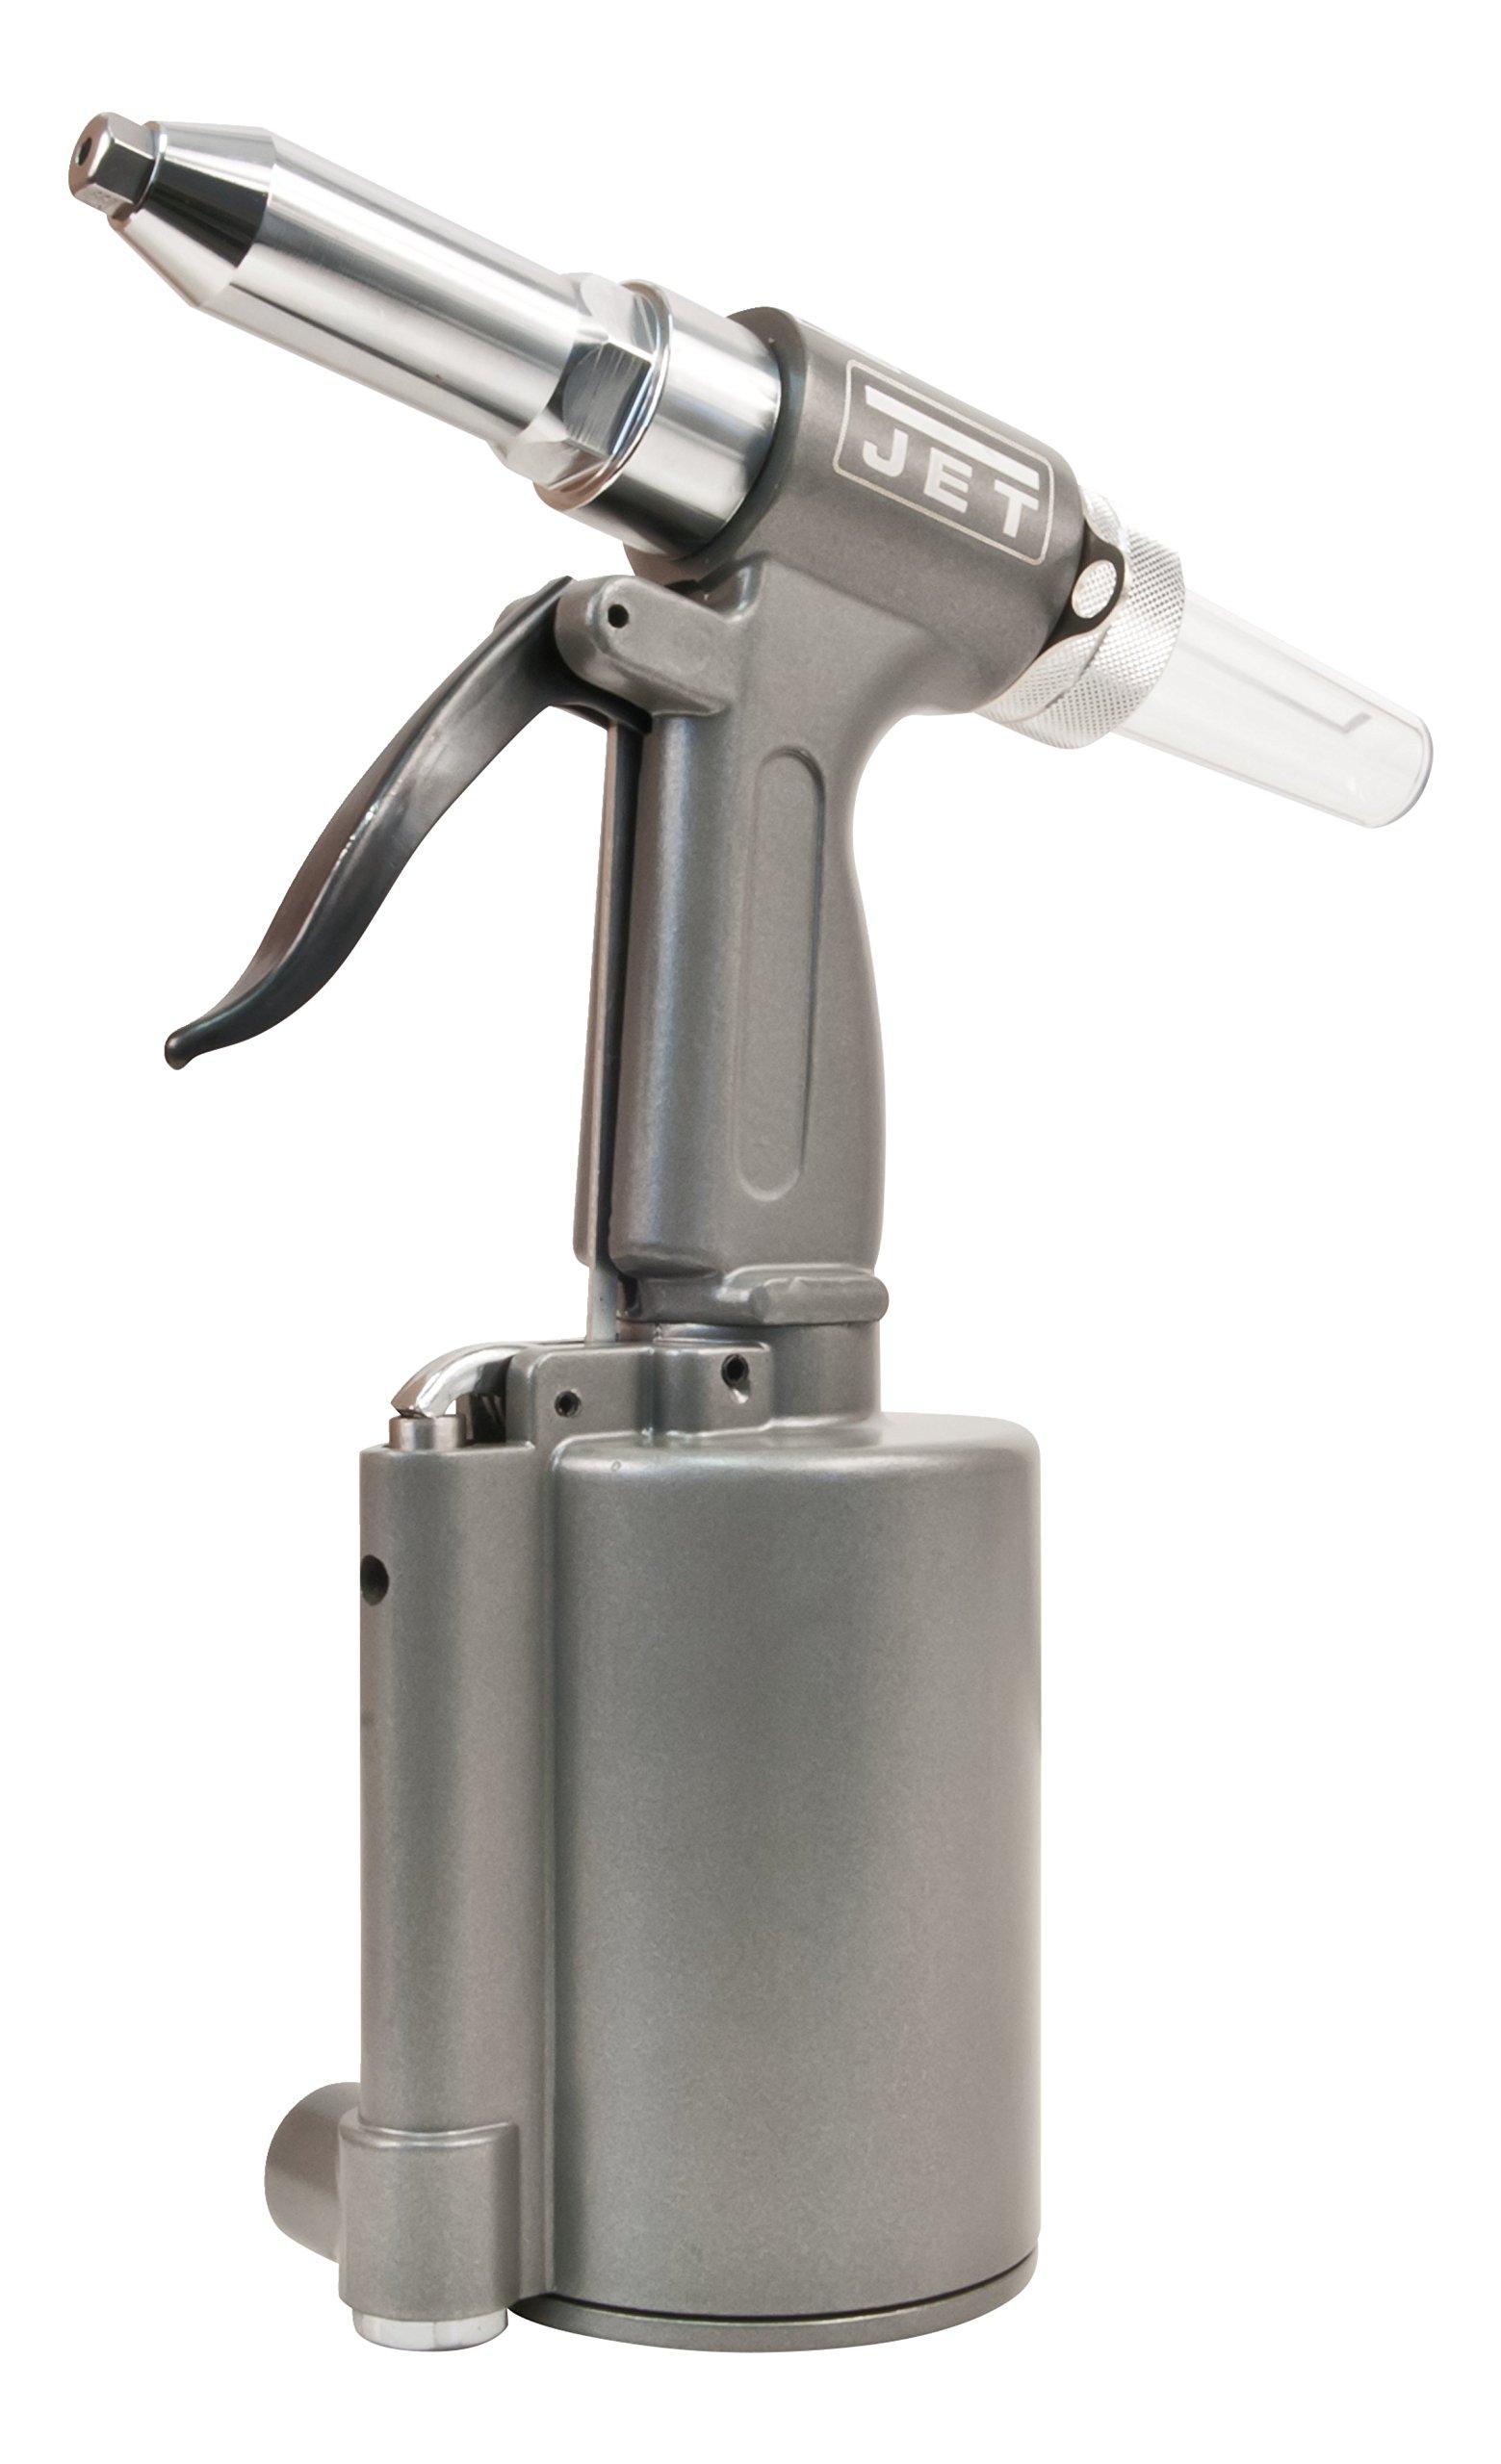 JET JAT-920 Pneumatic R6 Riveter